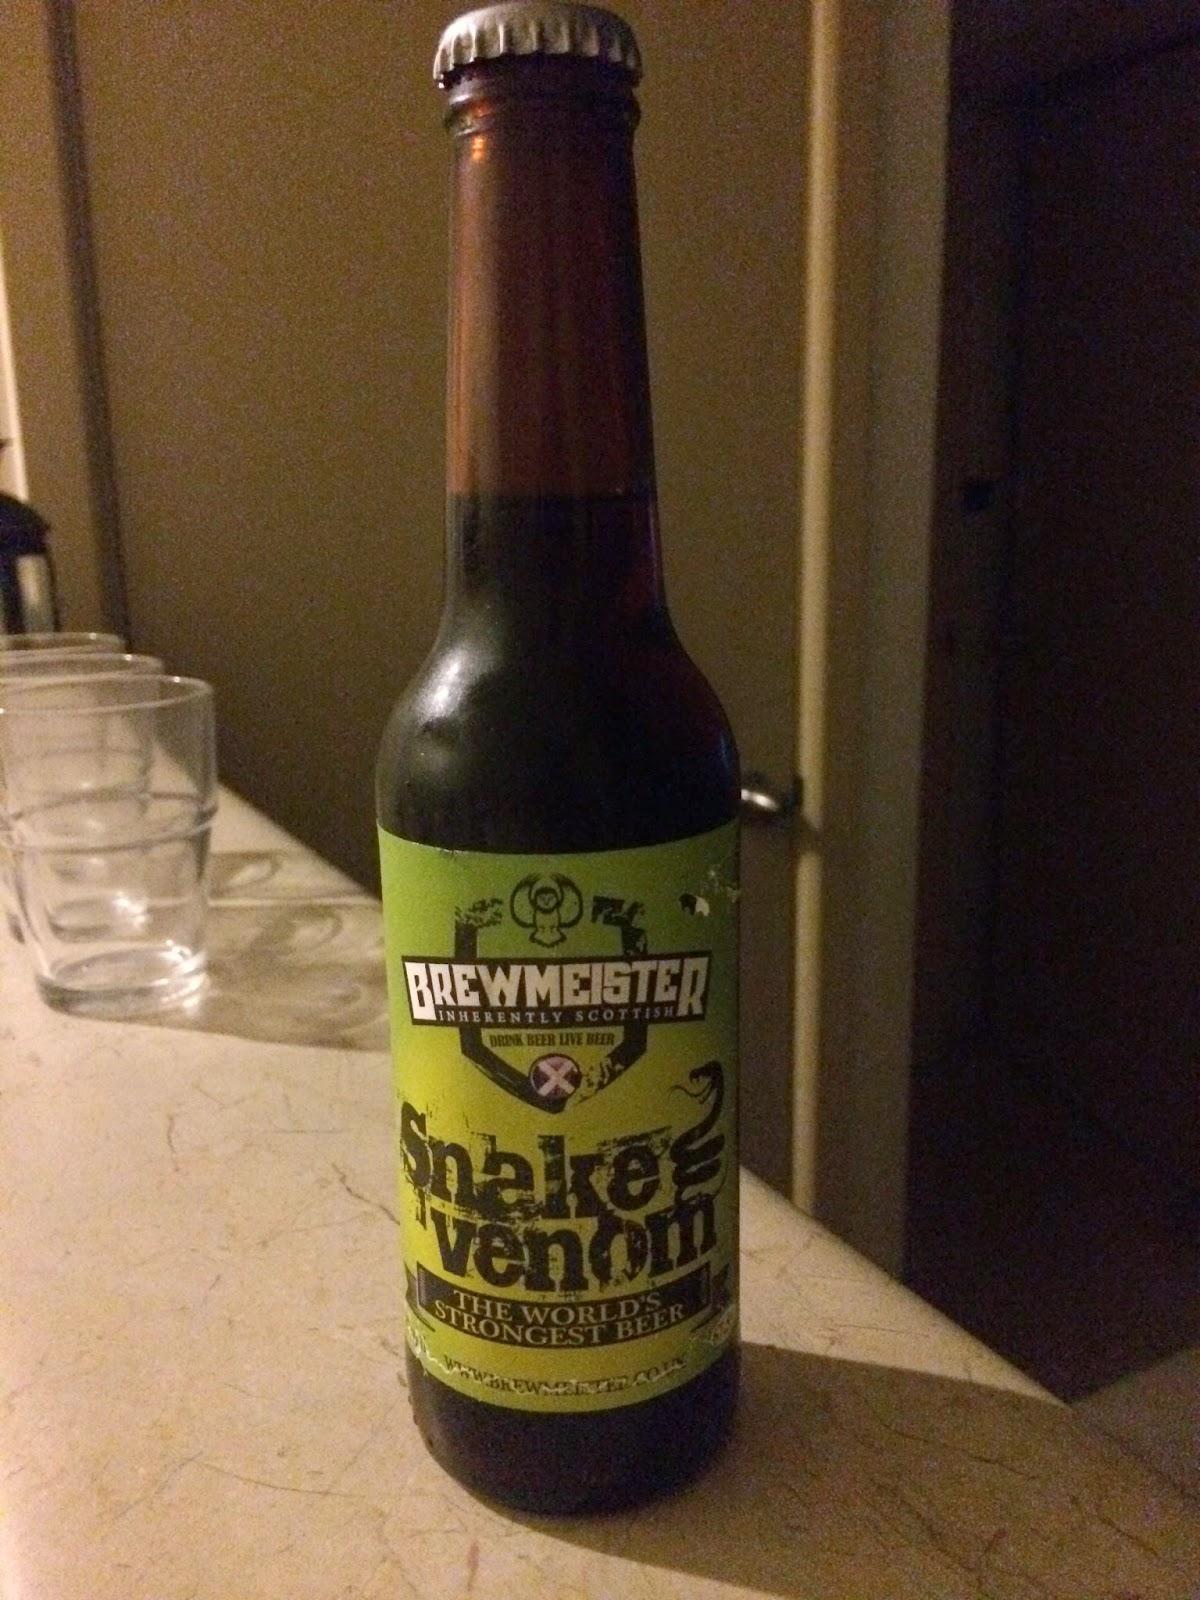 brewmeister snake venom beer price - digitalspace info